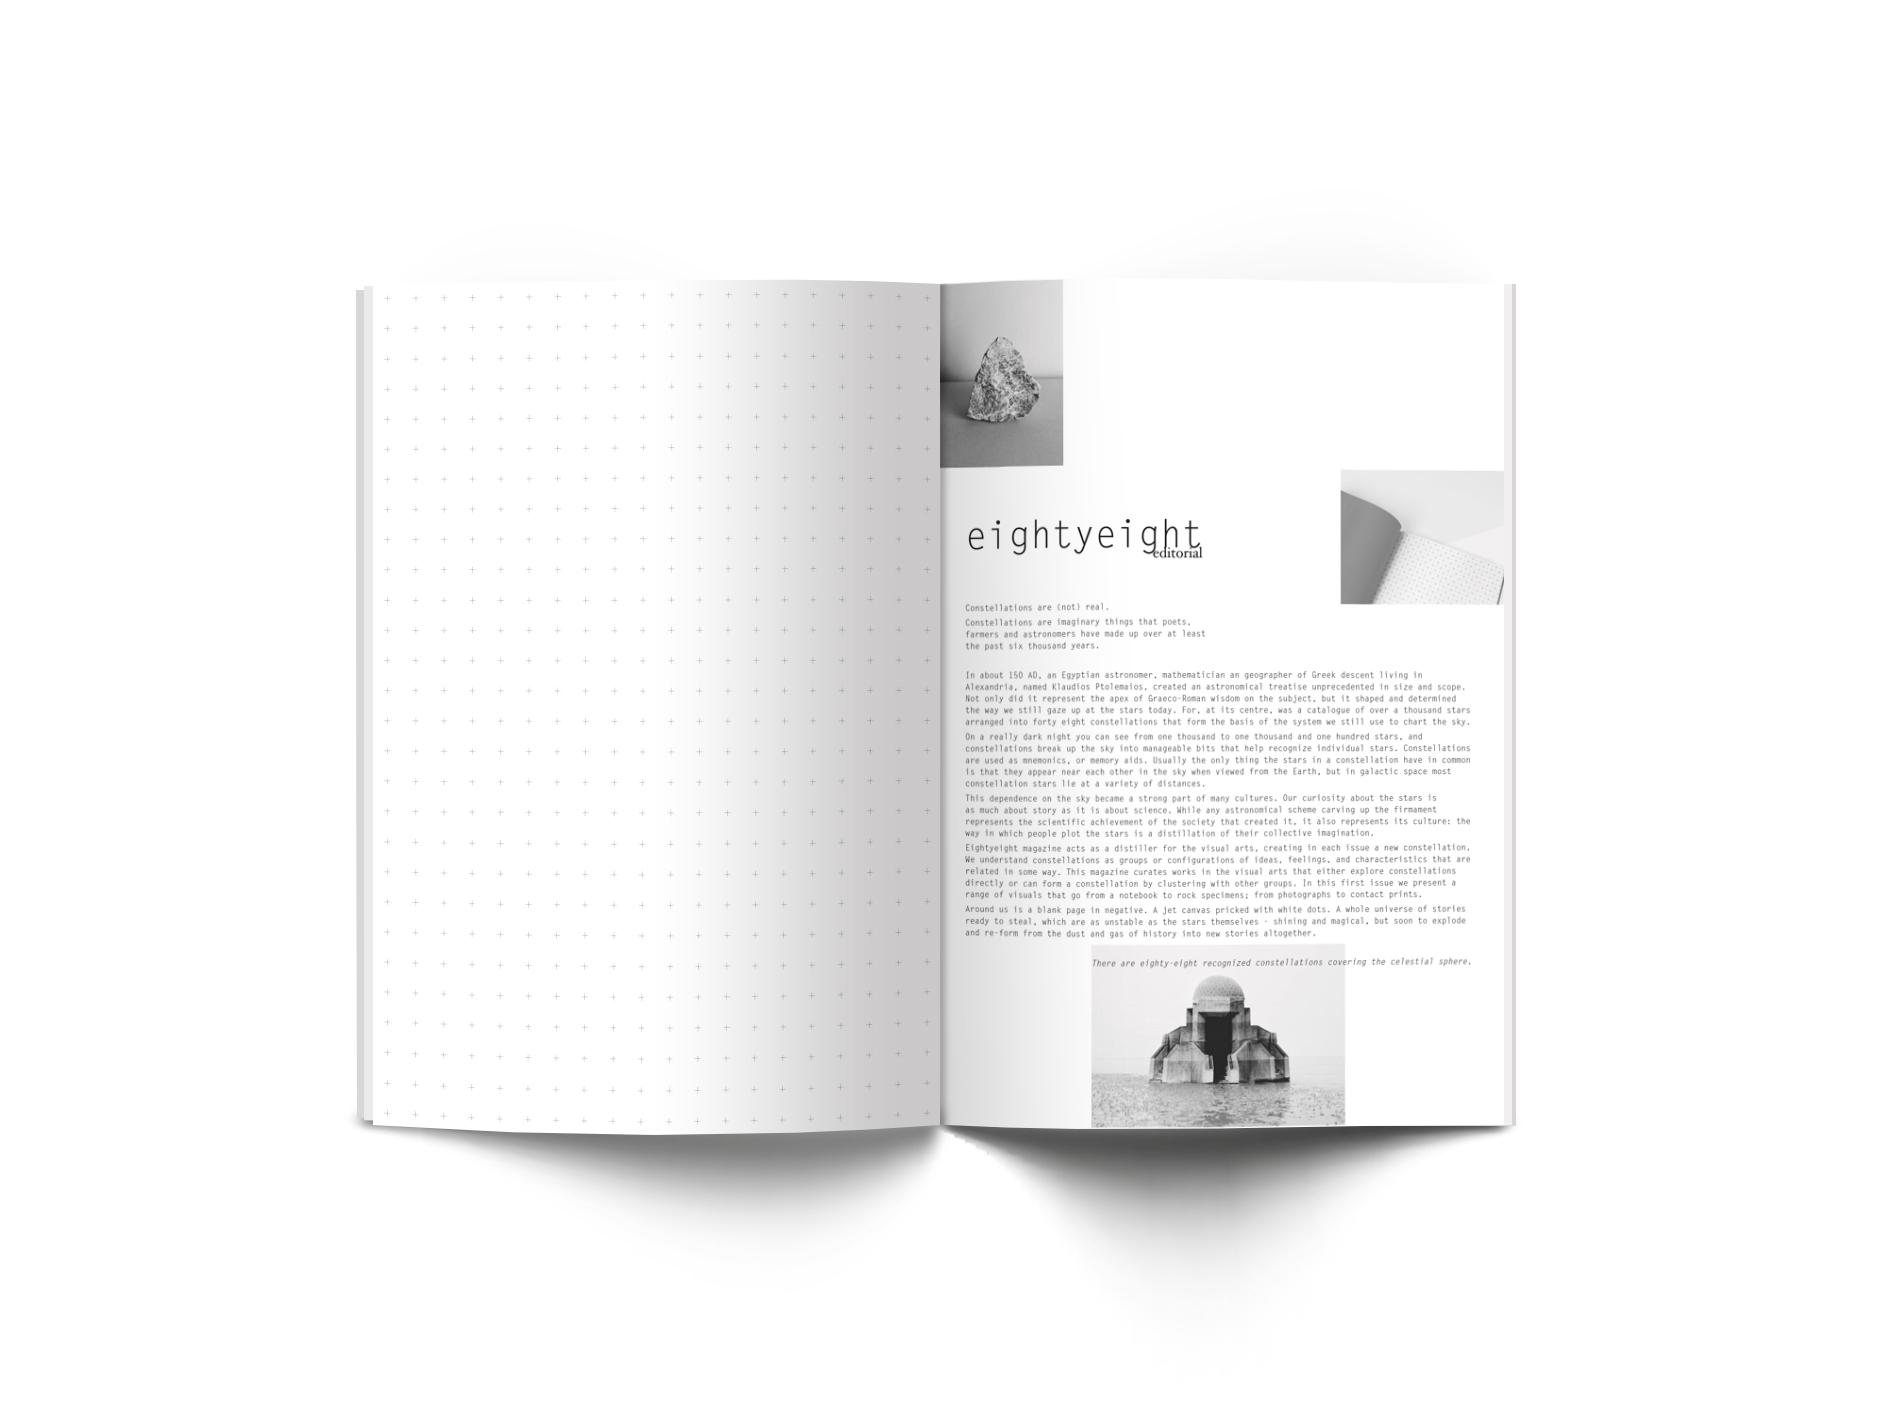 88 ed2.jpg